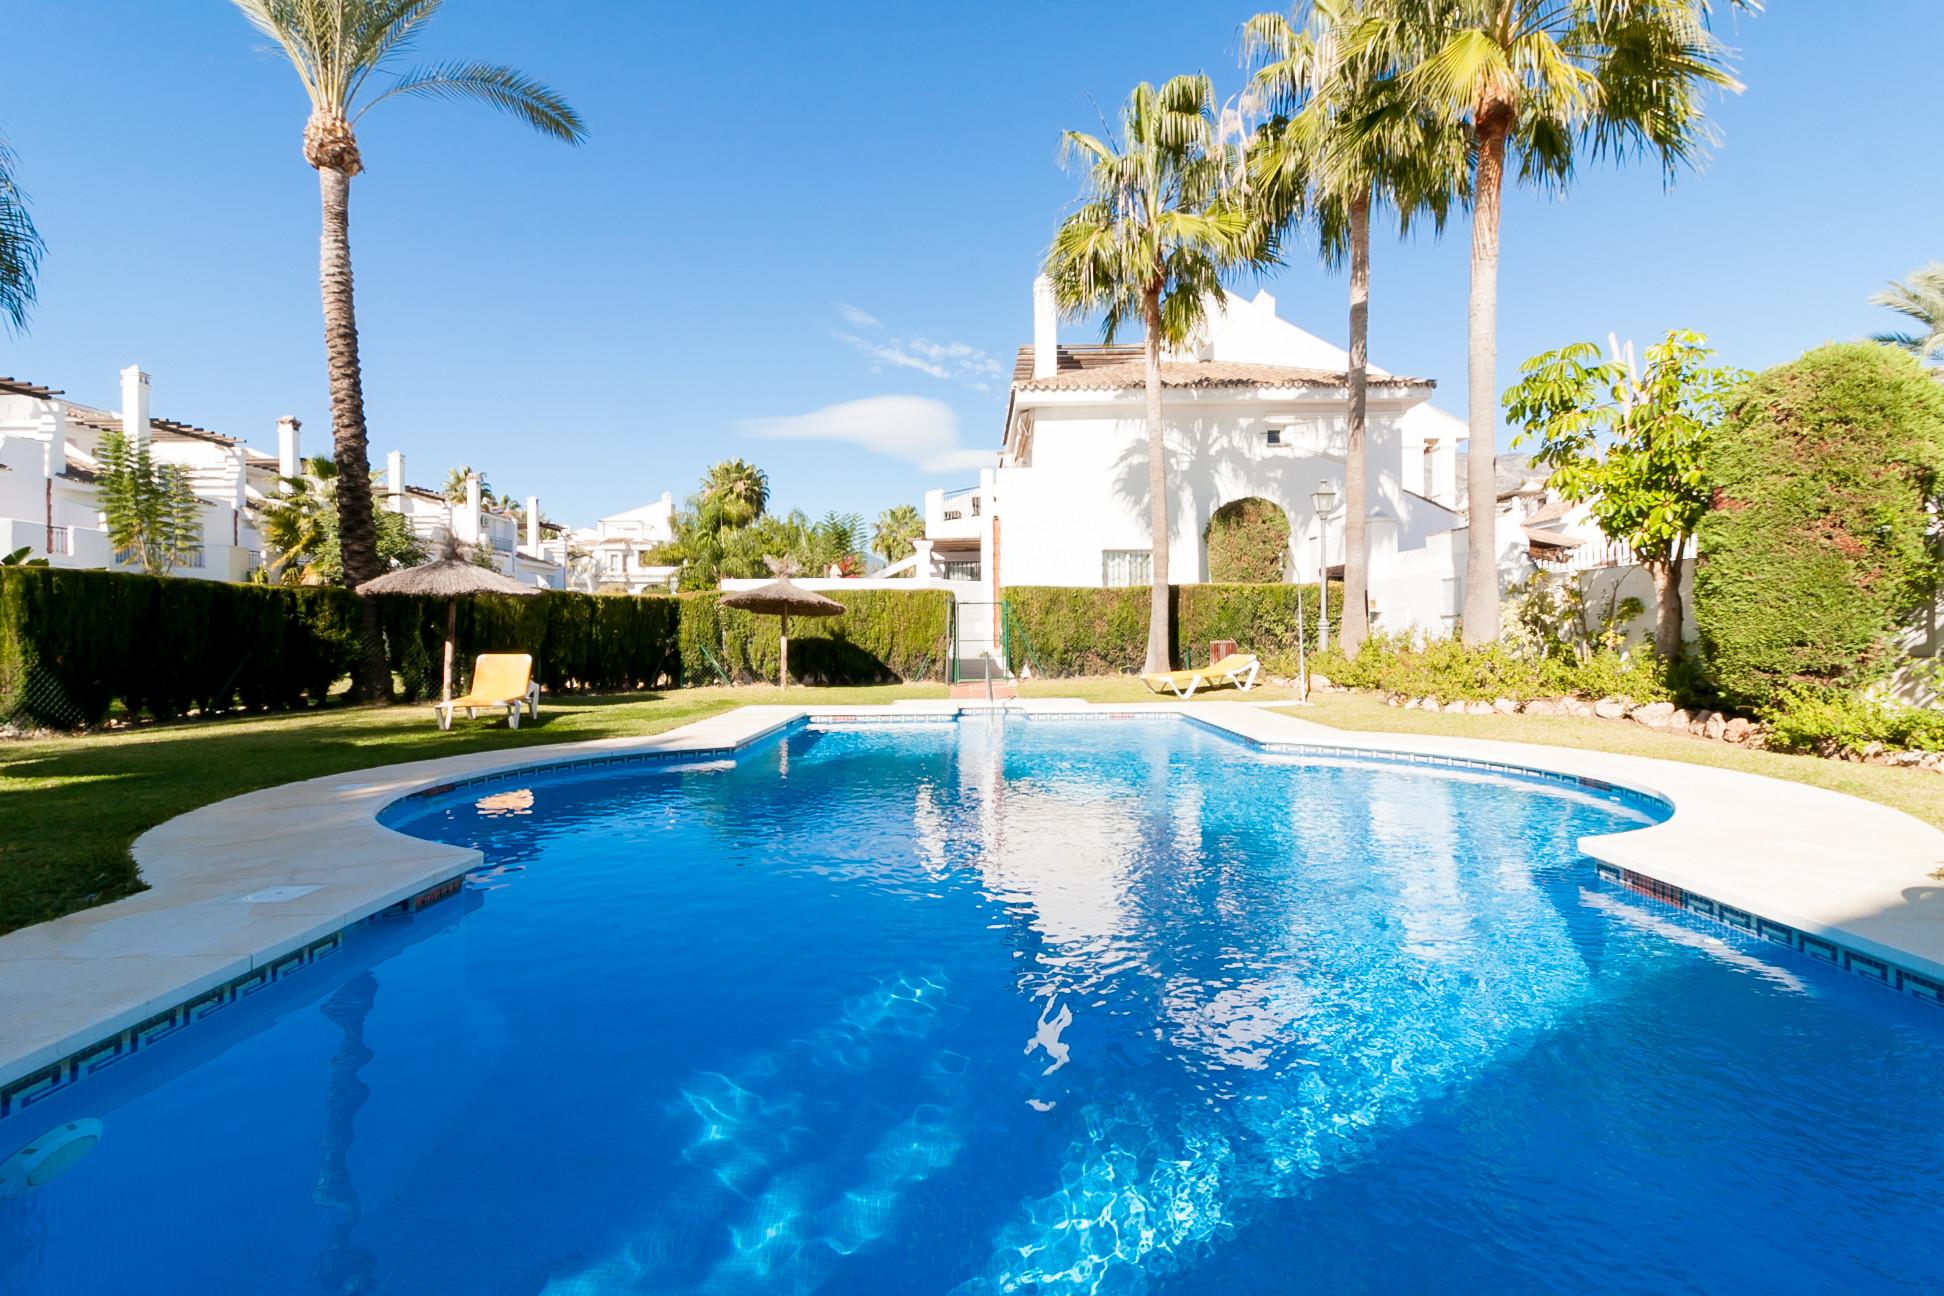 Naranjos Puerto Banus Apartment by GHR Rentals Ferienhaus in Spanien